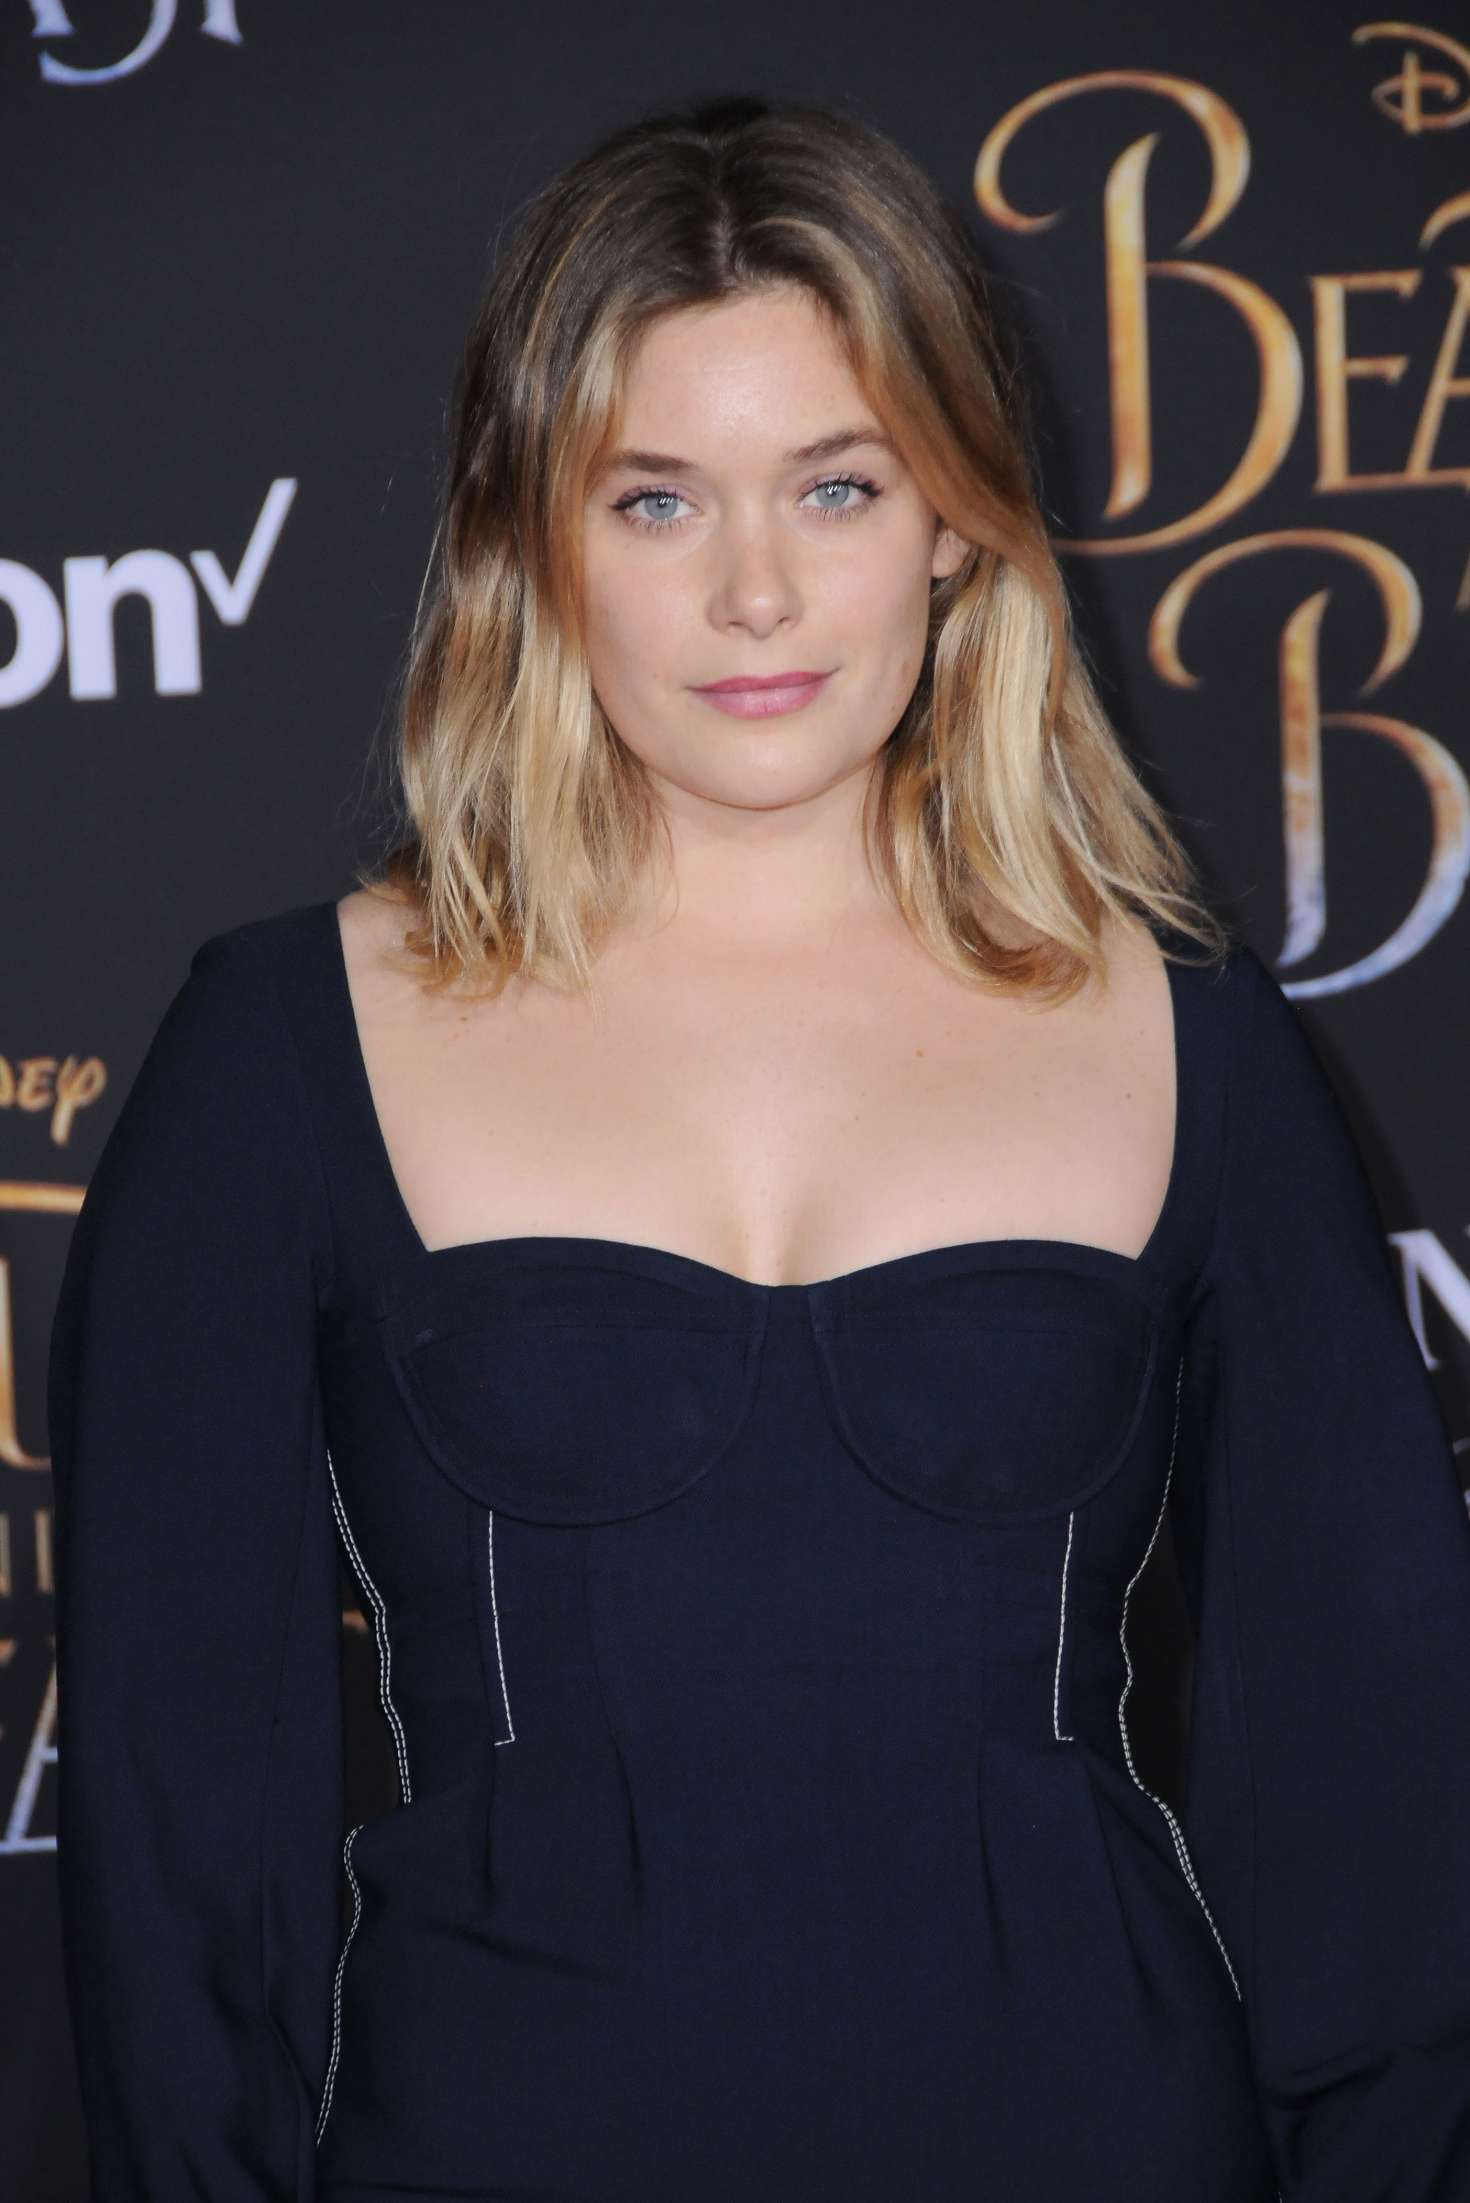 Rachel Keller - 'Beauty and the Beast' Premiere in Los Angeles